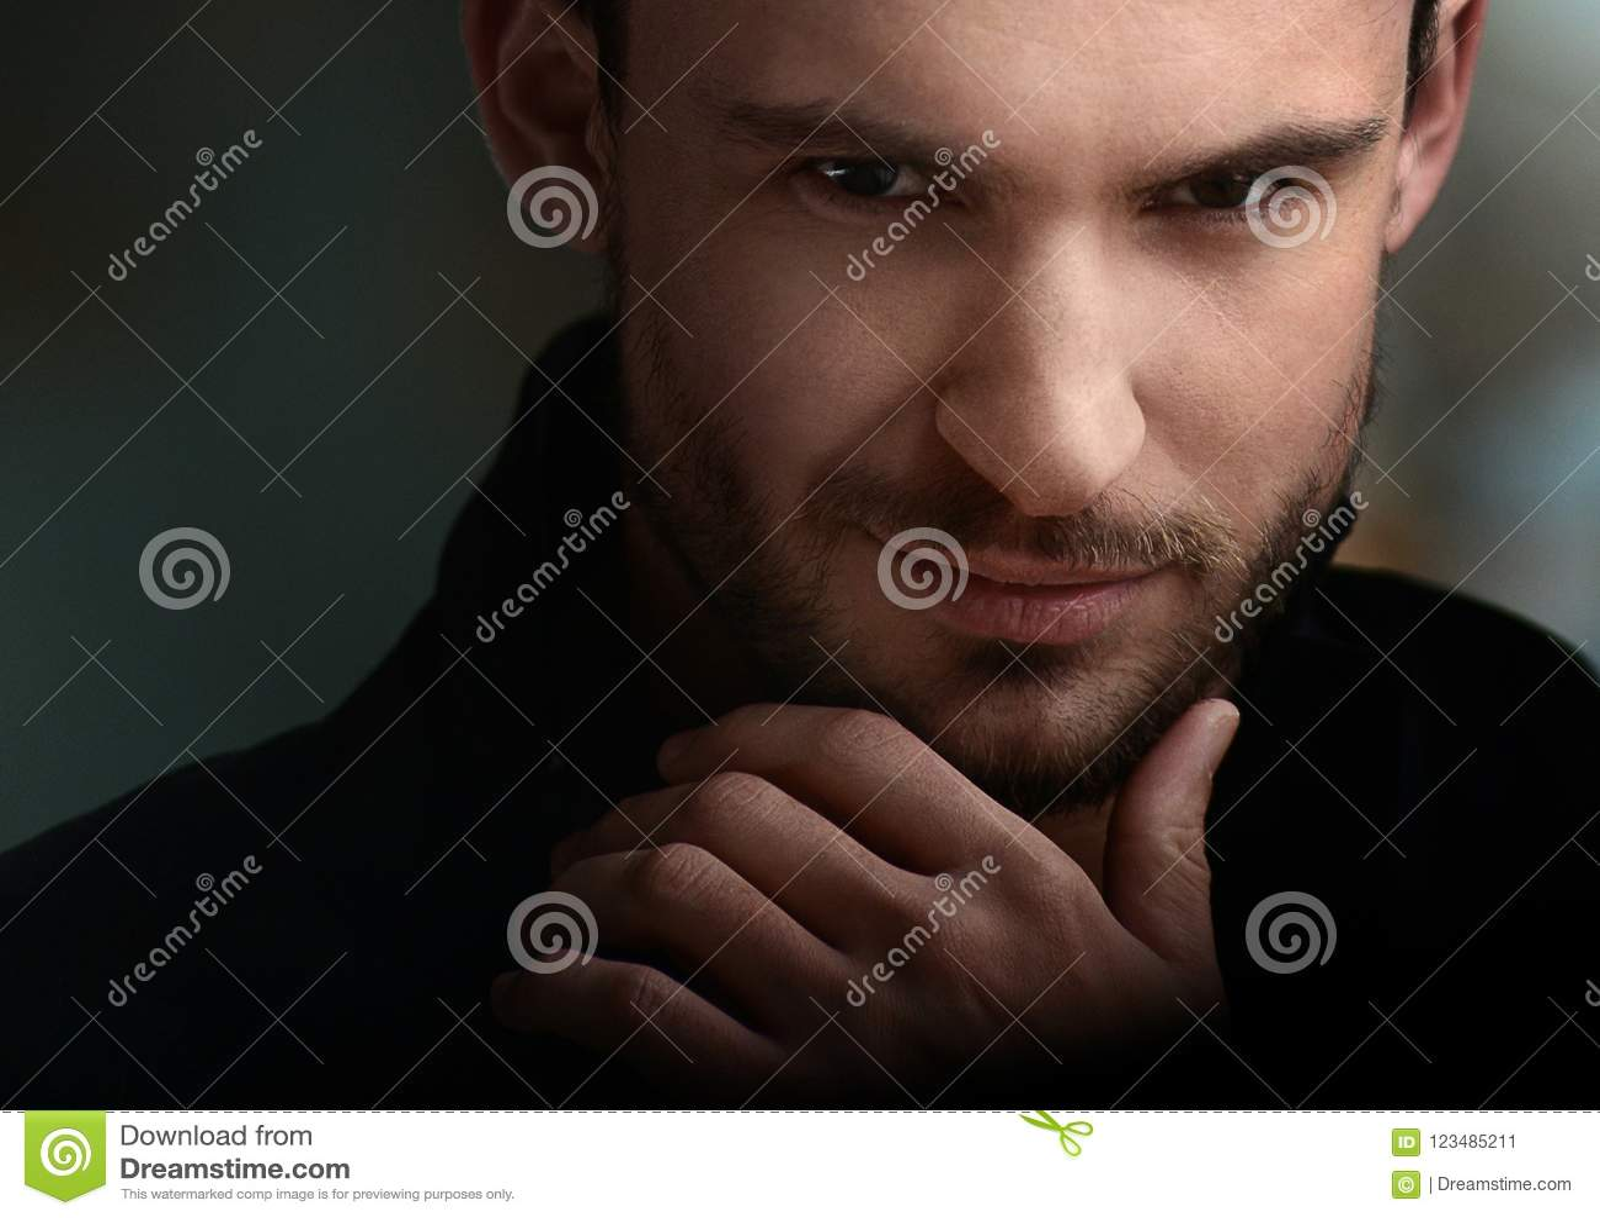 De zakenman glimlacht met vreugde op witte achtergrond